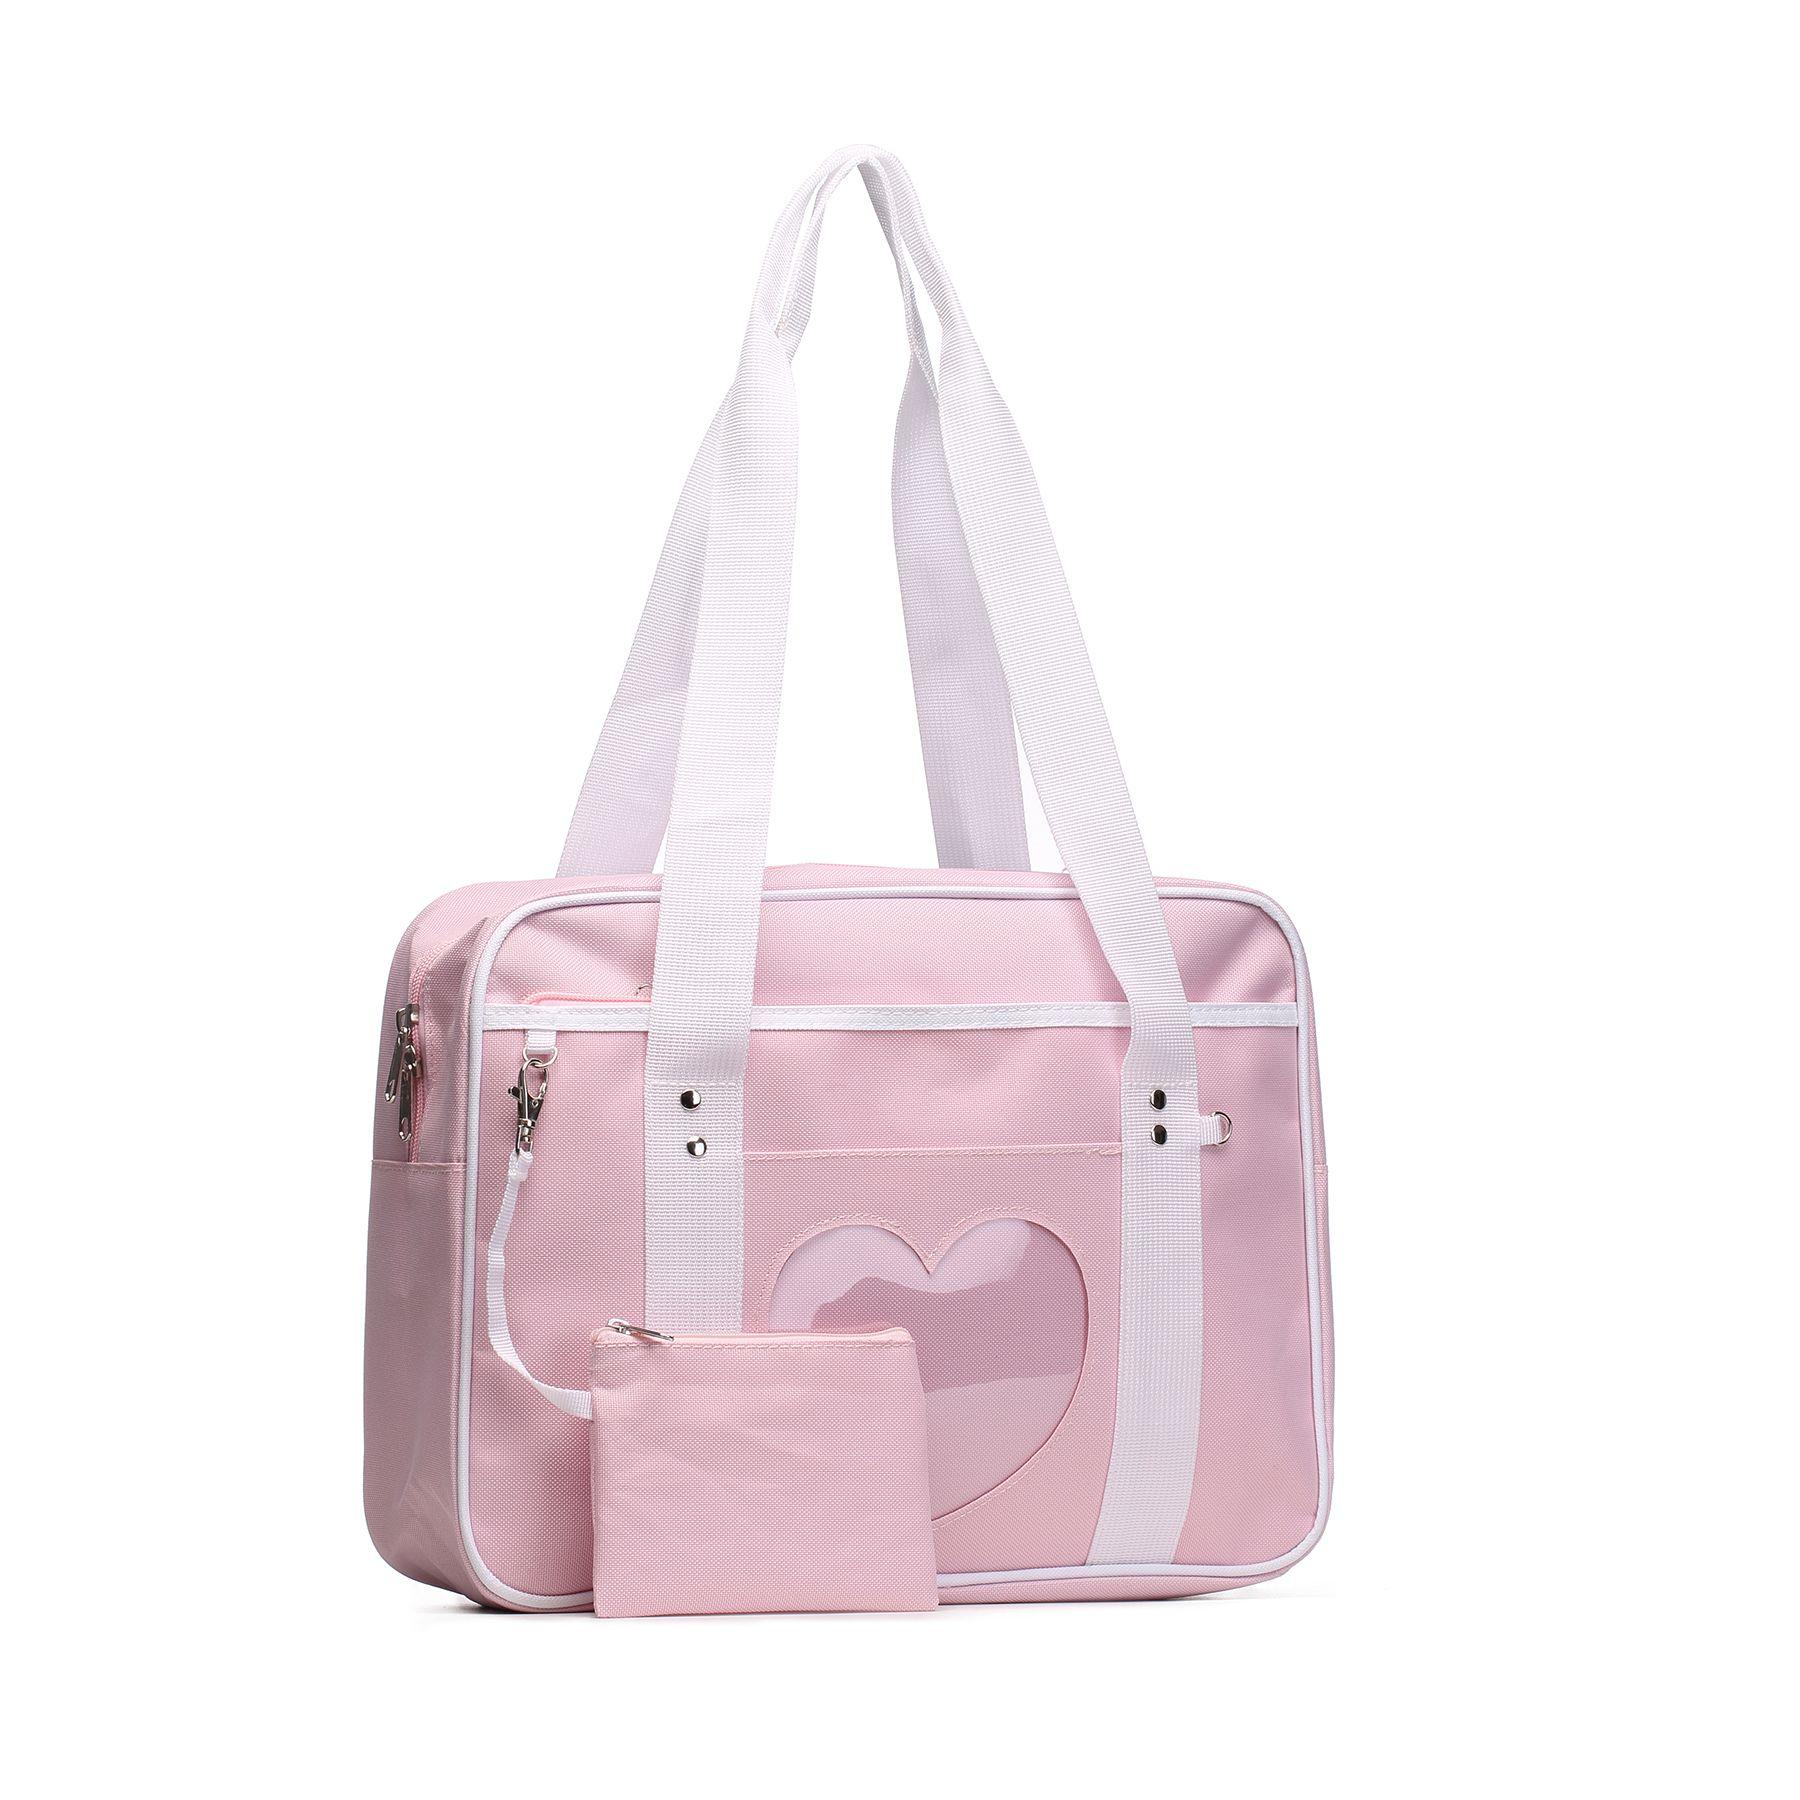 SteamedBun Ita Bag Heart Crossbody Bags for Women Girls Small Clear Phone Wallet